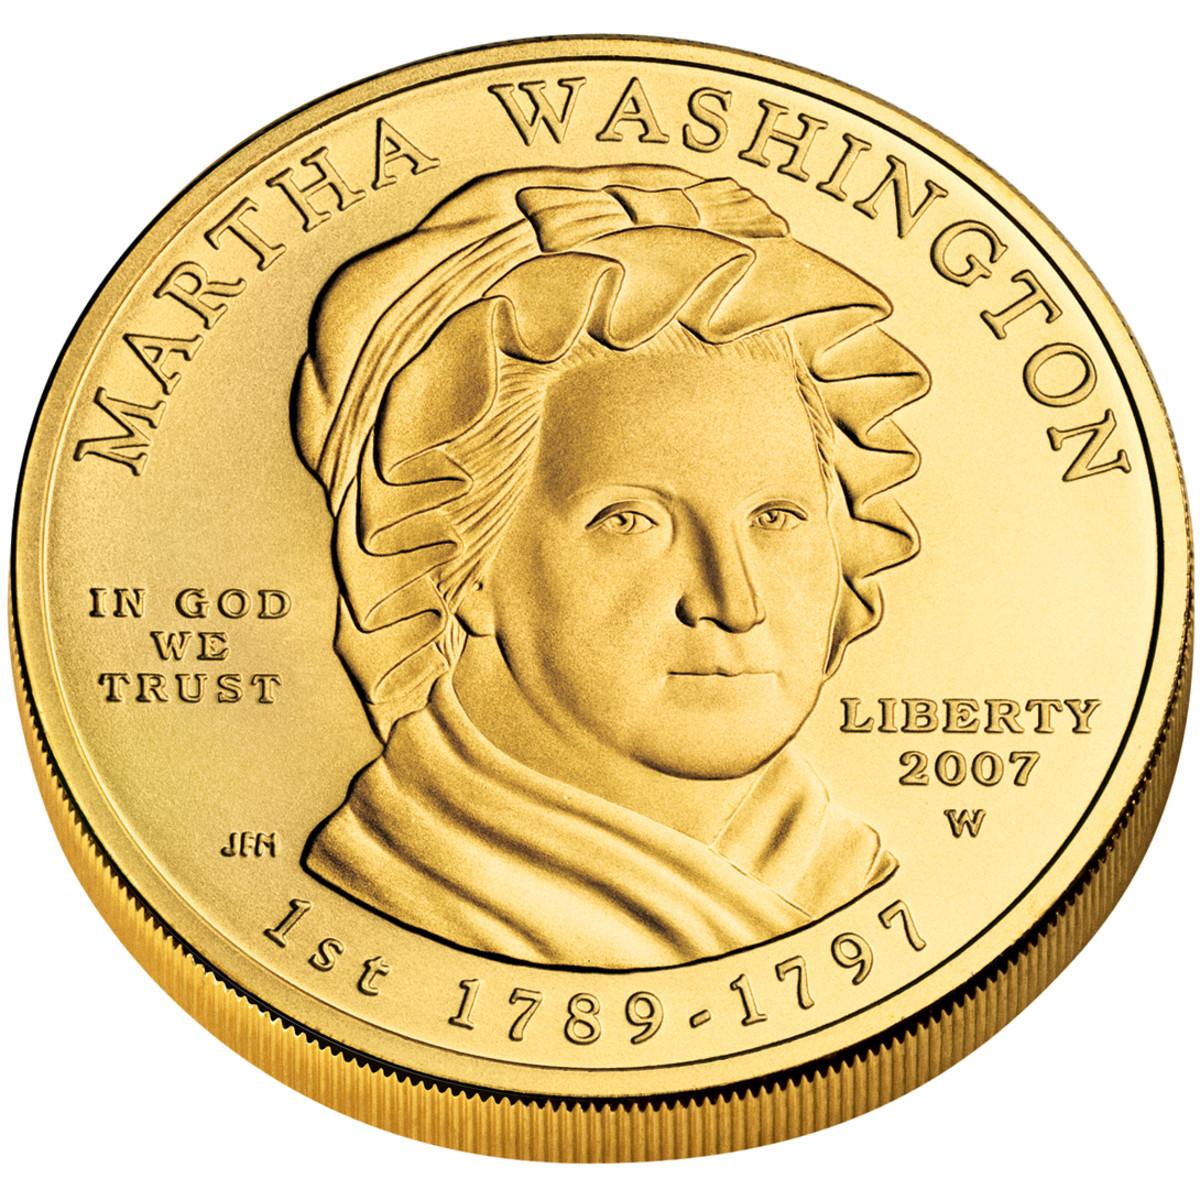 2007-W First Spouse Program coin for Martha Washington.